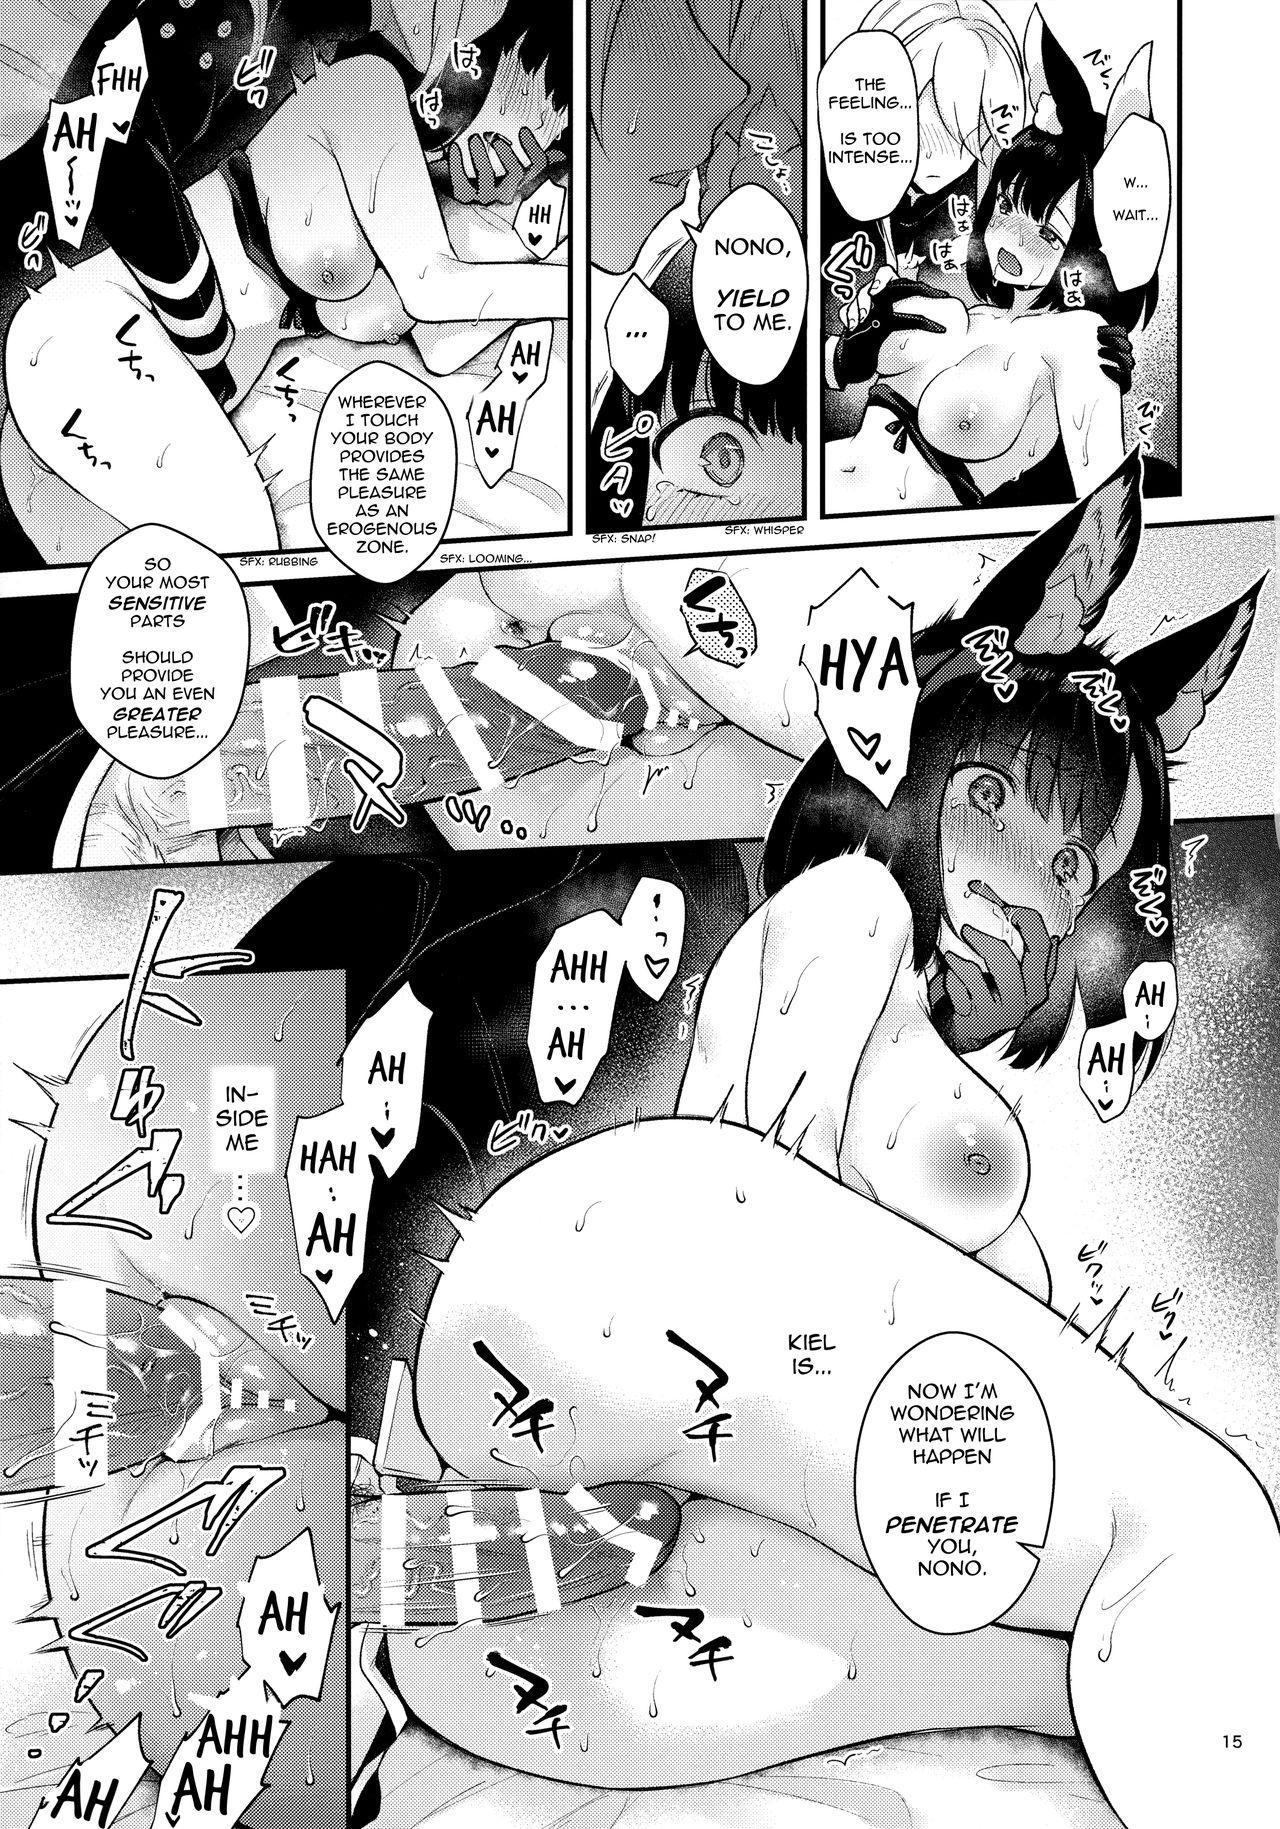 [Calm White (Mashiro Shirako)] Shirako)] Hound-chan Icha Love Saimin Sex | Lovey-Dovey Hypno Sex with Rover (Etrian Odyssey) [English] [incogna777] 13